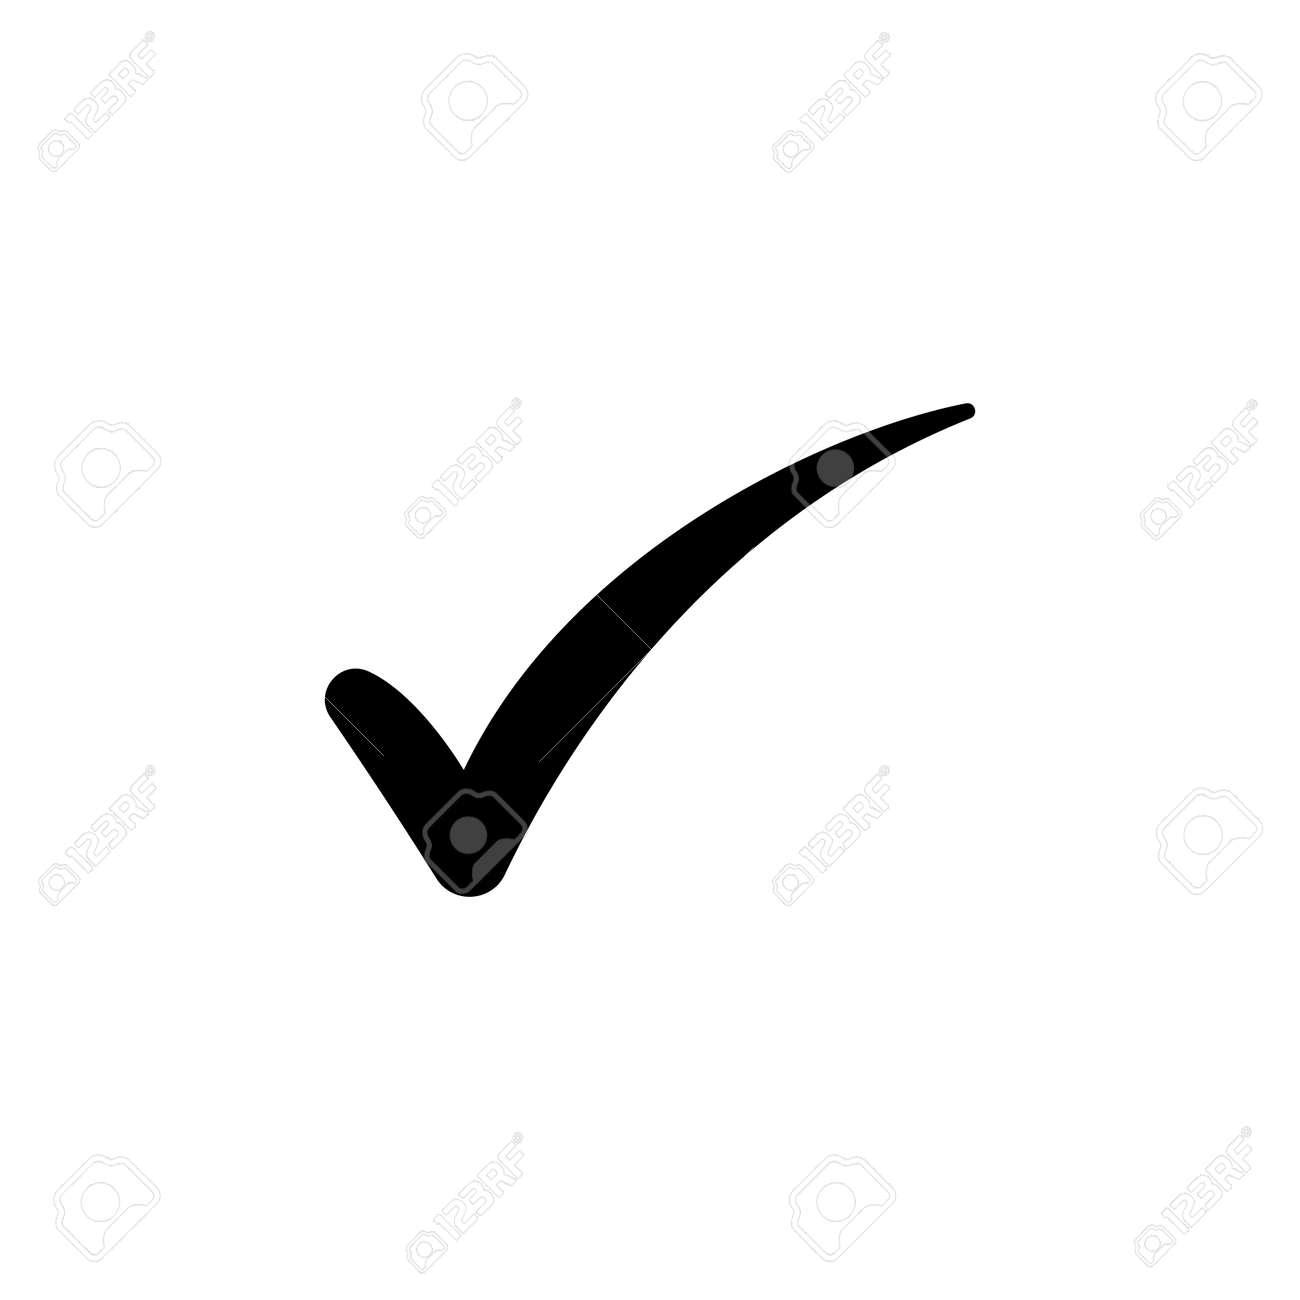 Check mark symbol, vector - 96237912